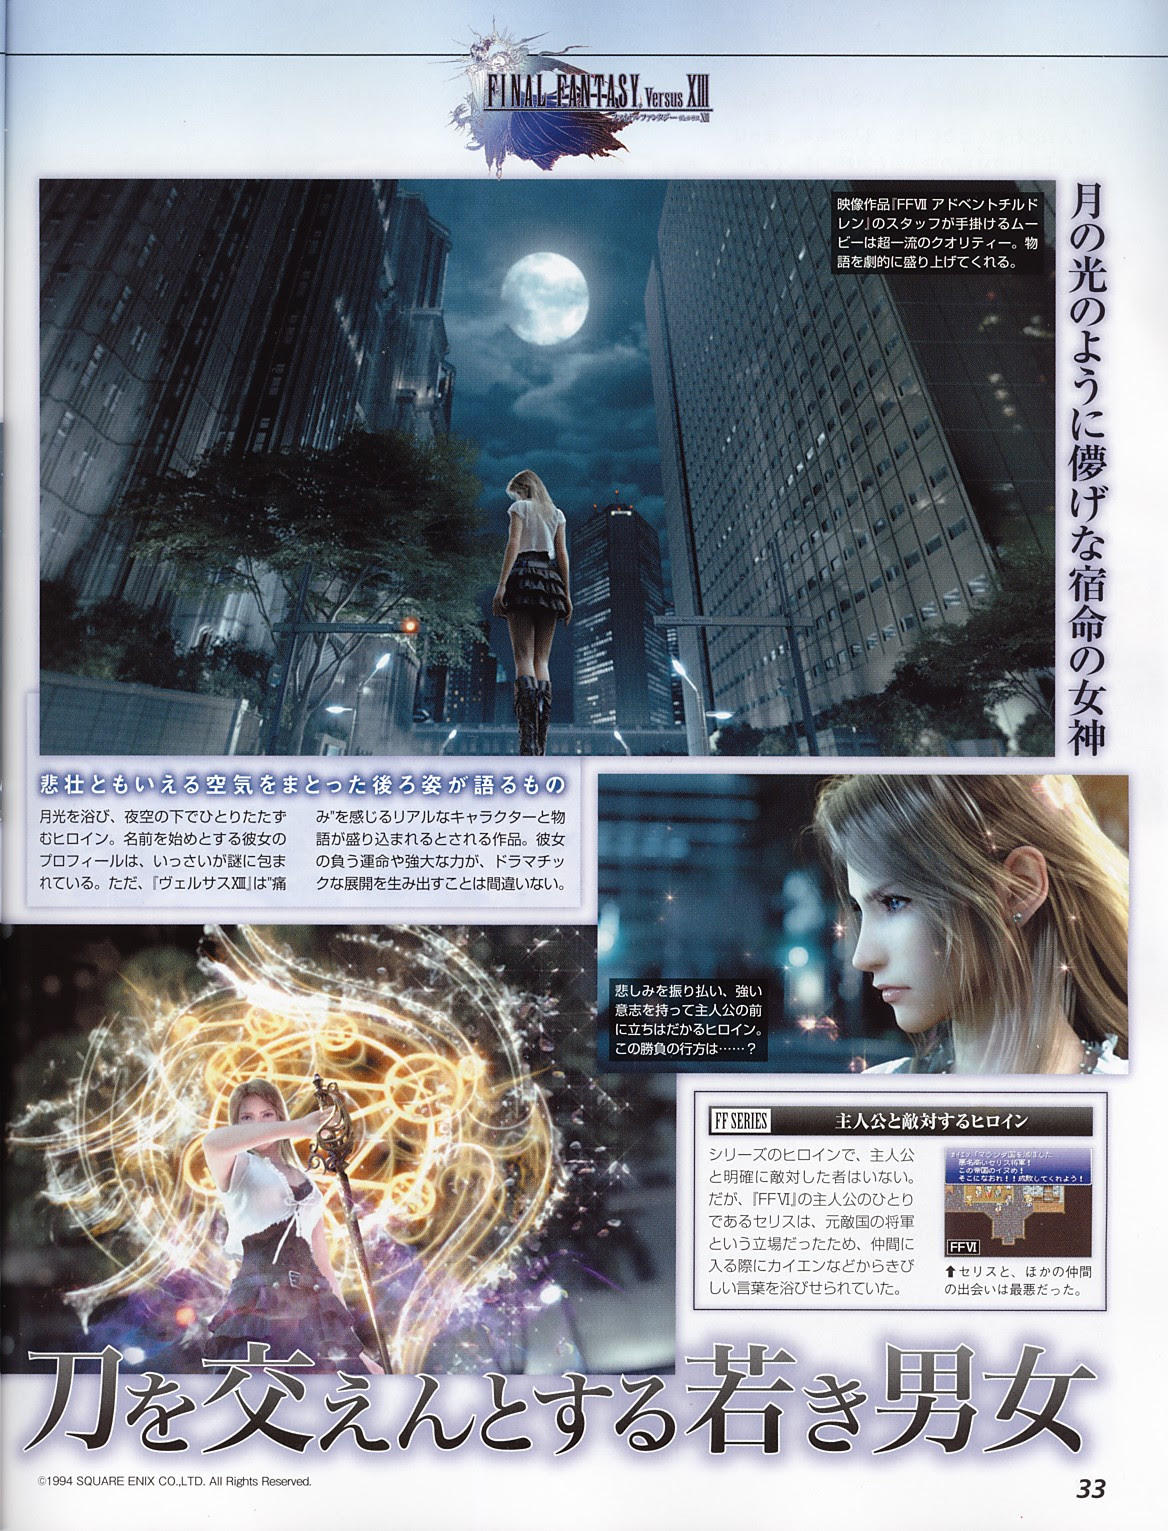 Ff Versus Xiii Magazine Scans Final Fantasy Xiii Photo 674462